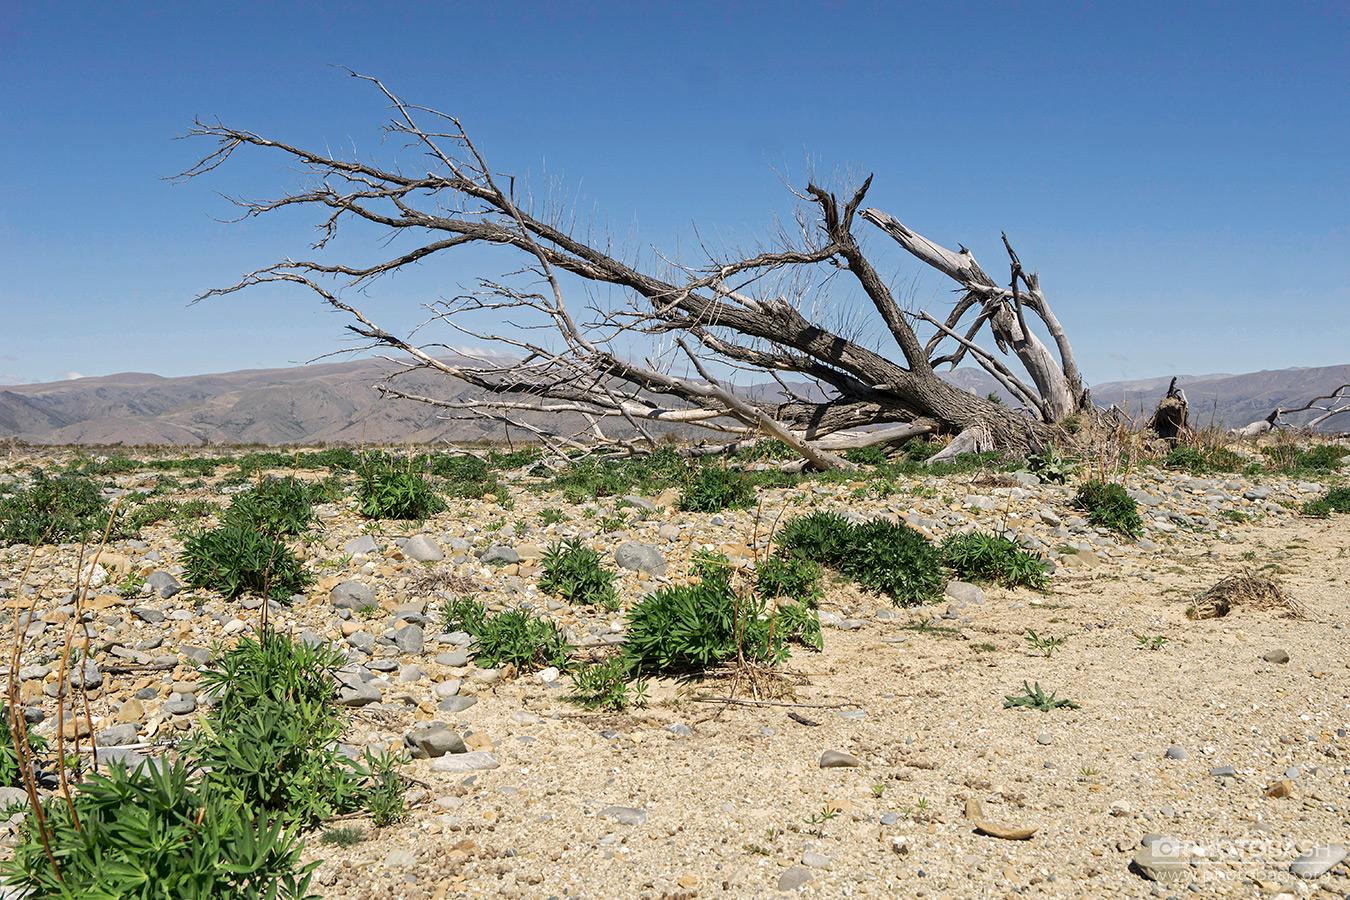 Clay-Cliffs-Wasteland-Dead-Tree.jpg